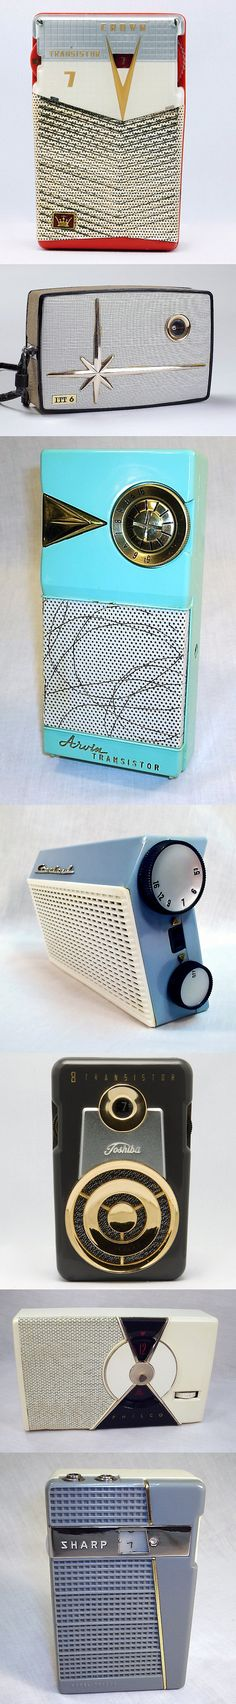 Transistor Radios - Atomic 1950's Mid Century / Portable Radio / Vintage / Retro…